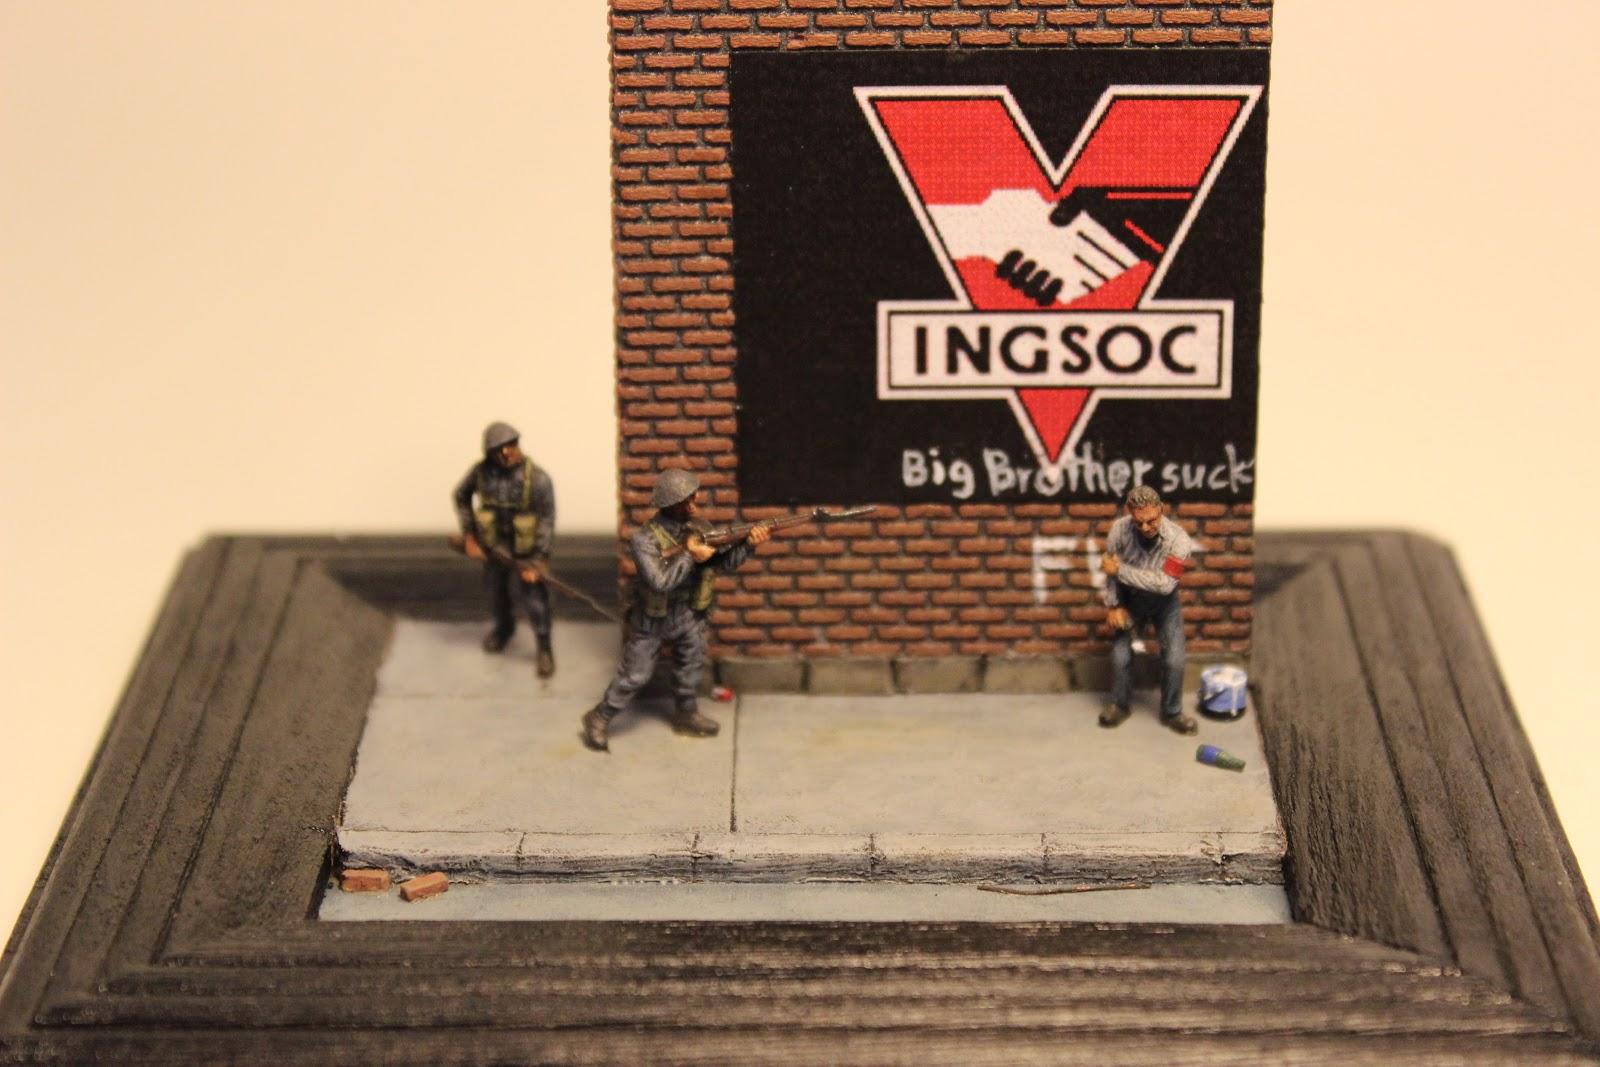 militaryminis my latest diorama a homage to orwell s 1984 my latest diorama a homage to orwell s 1984